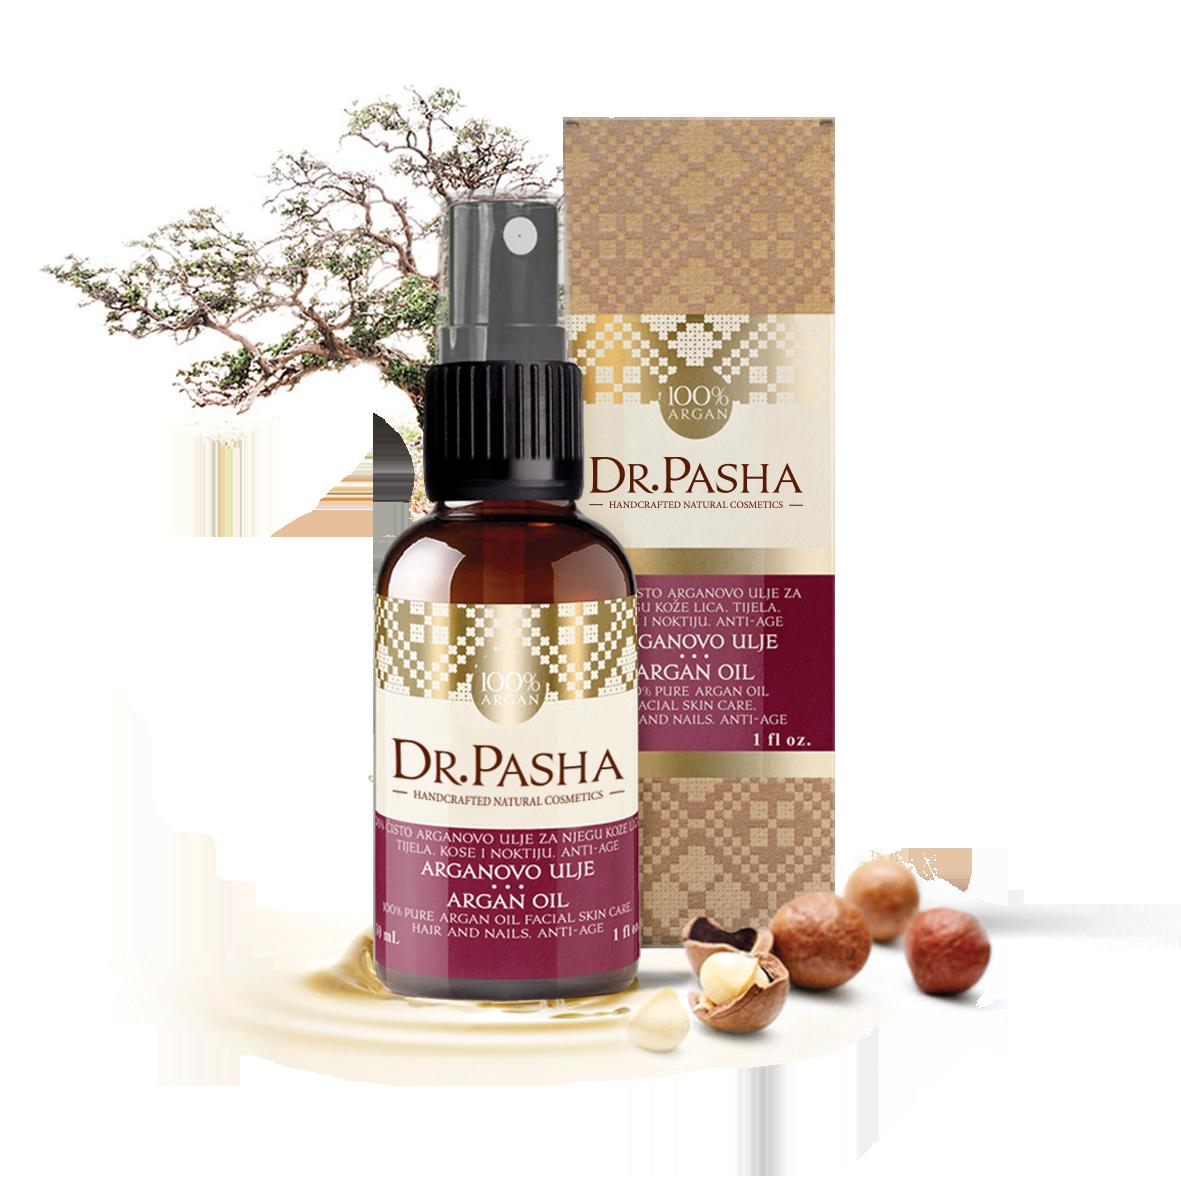 Drpasha 100 Pure Argan Oil